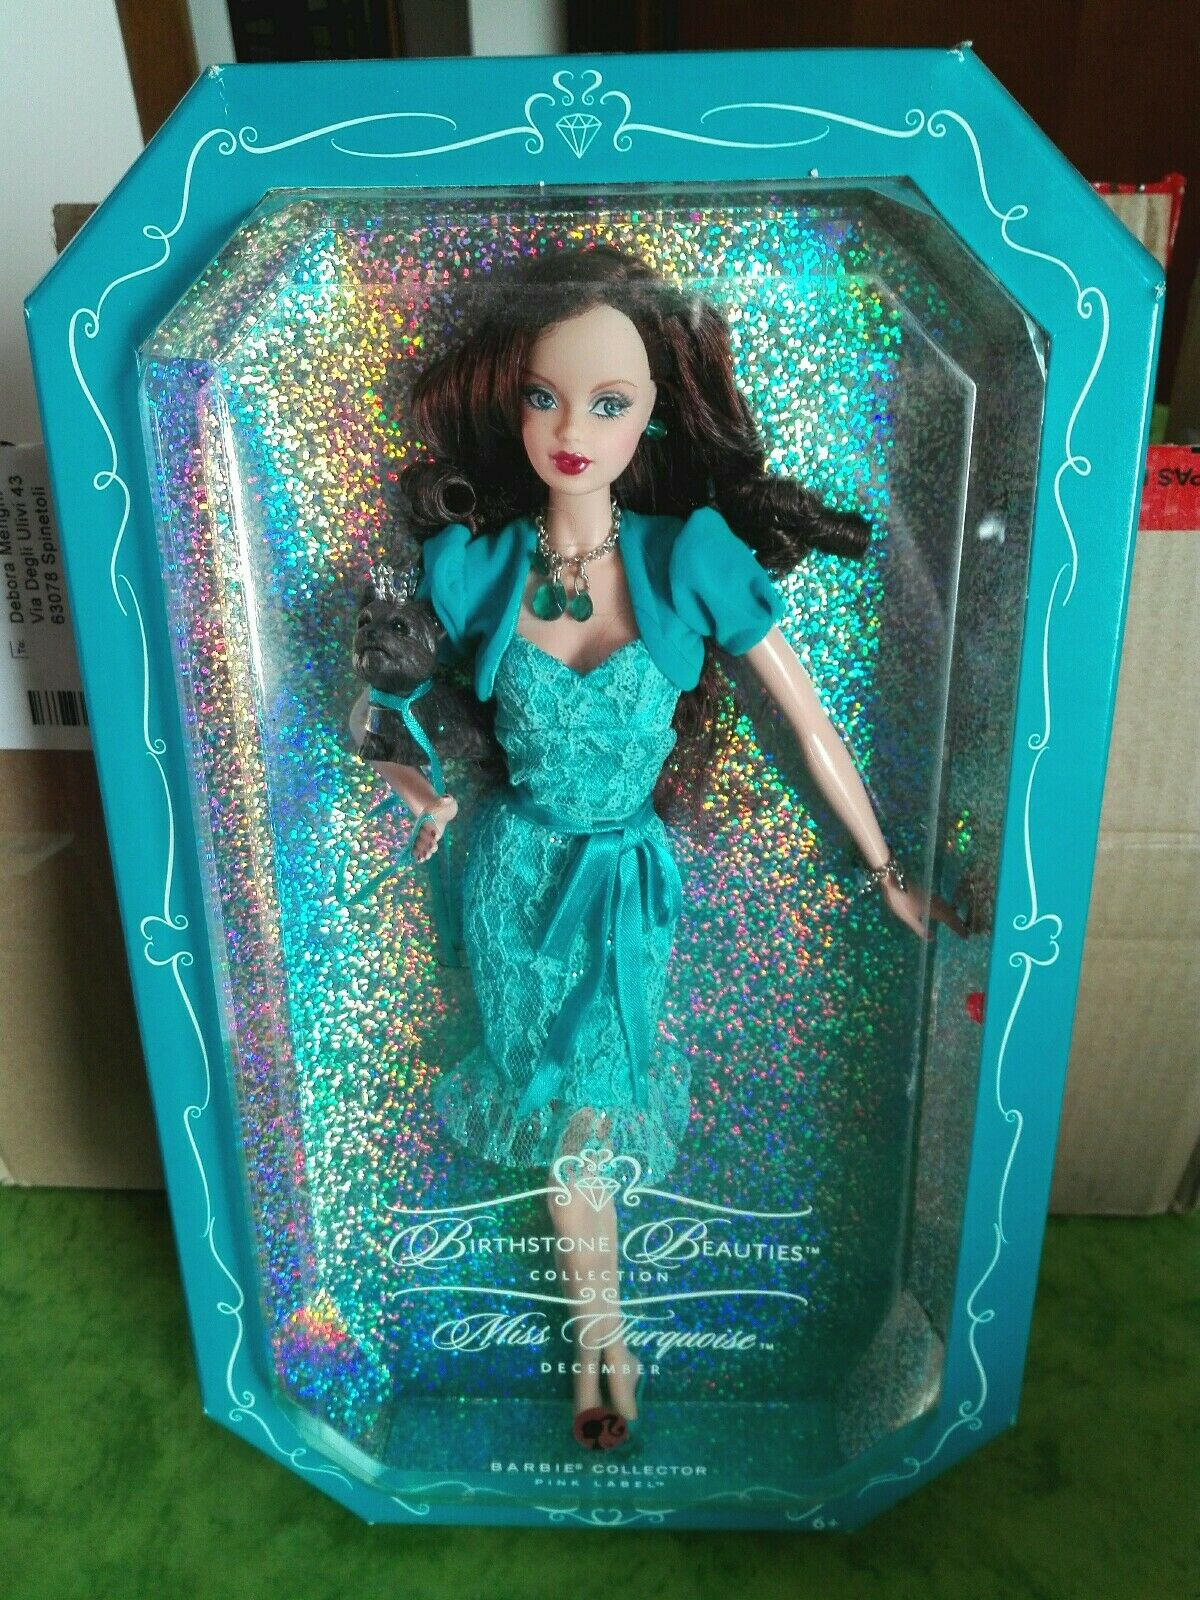 BARBIE BIRTHSTONE BEAUTIES DECEMBER TURQUOISE NRFB - new model muse doll Mattel